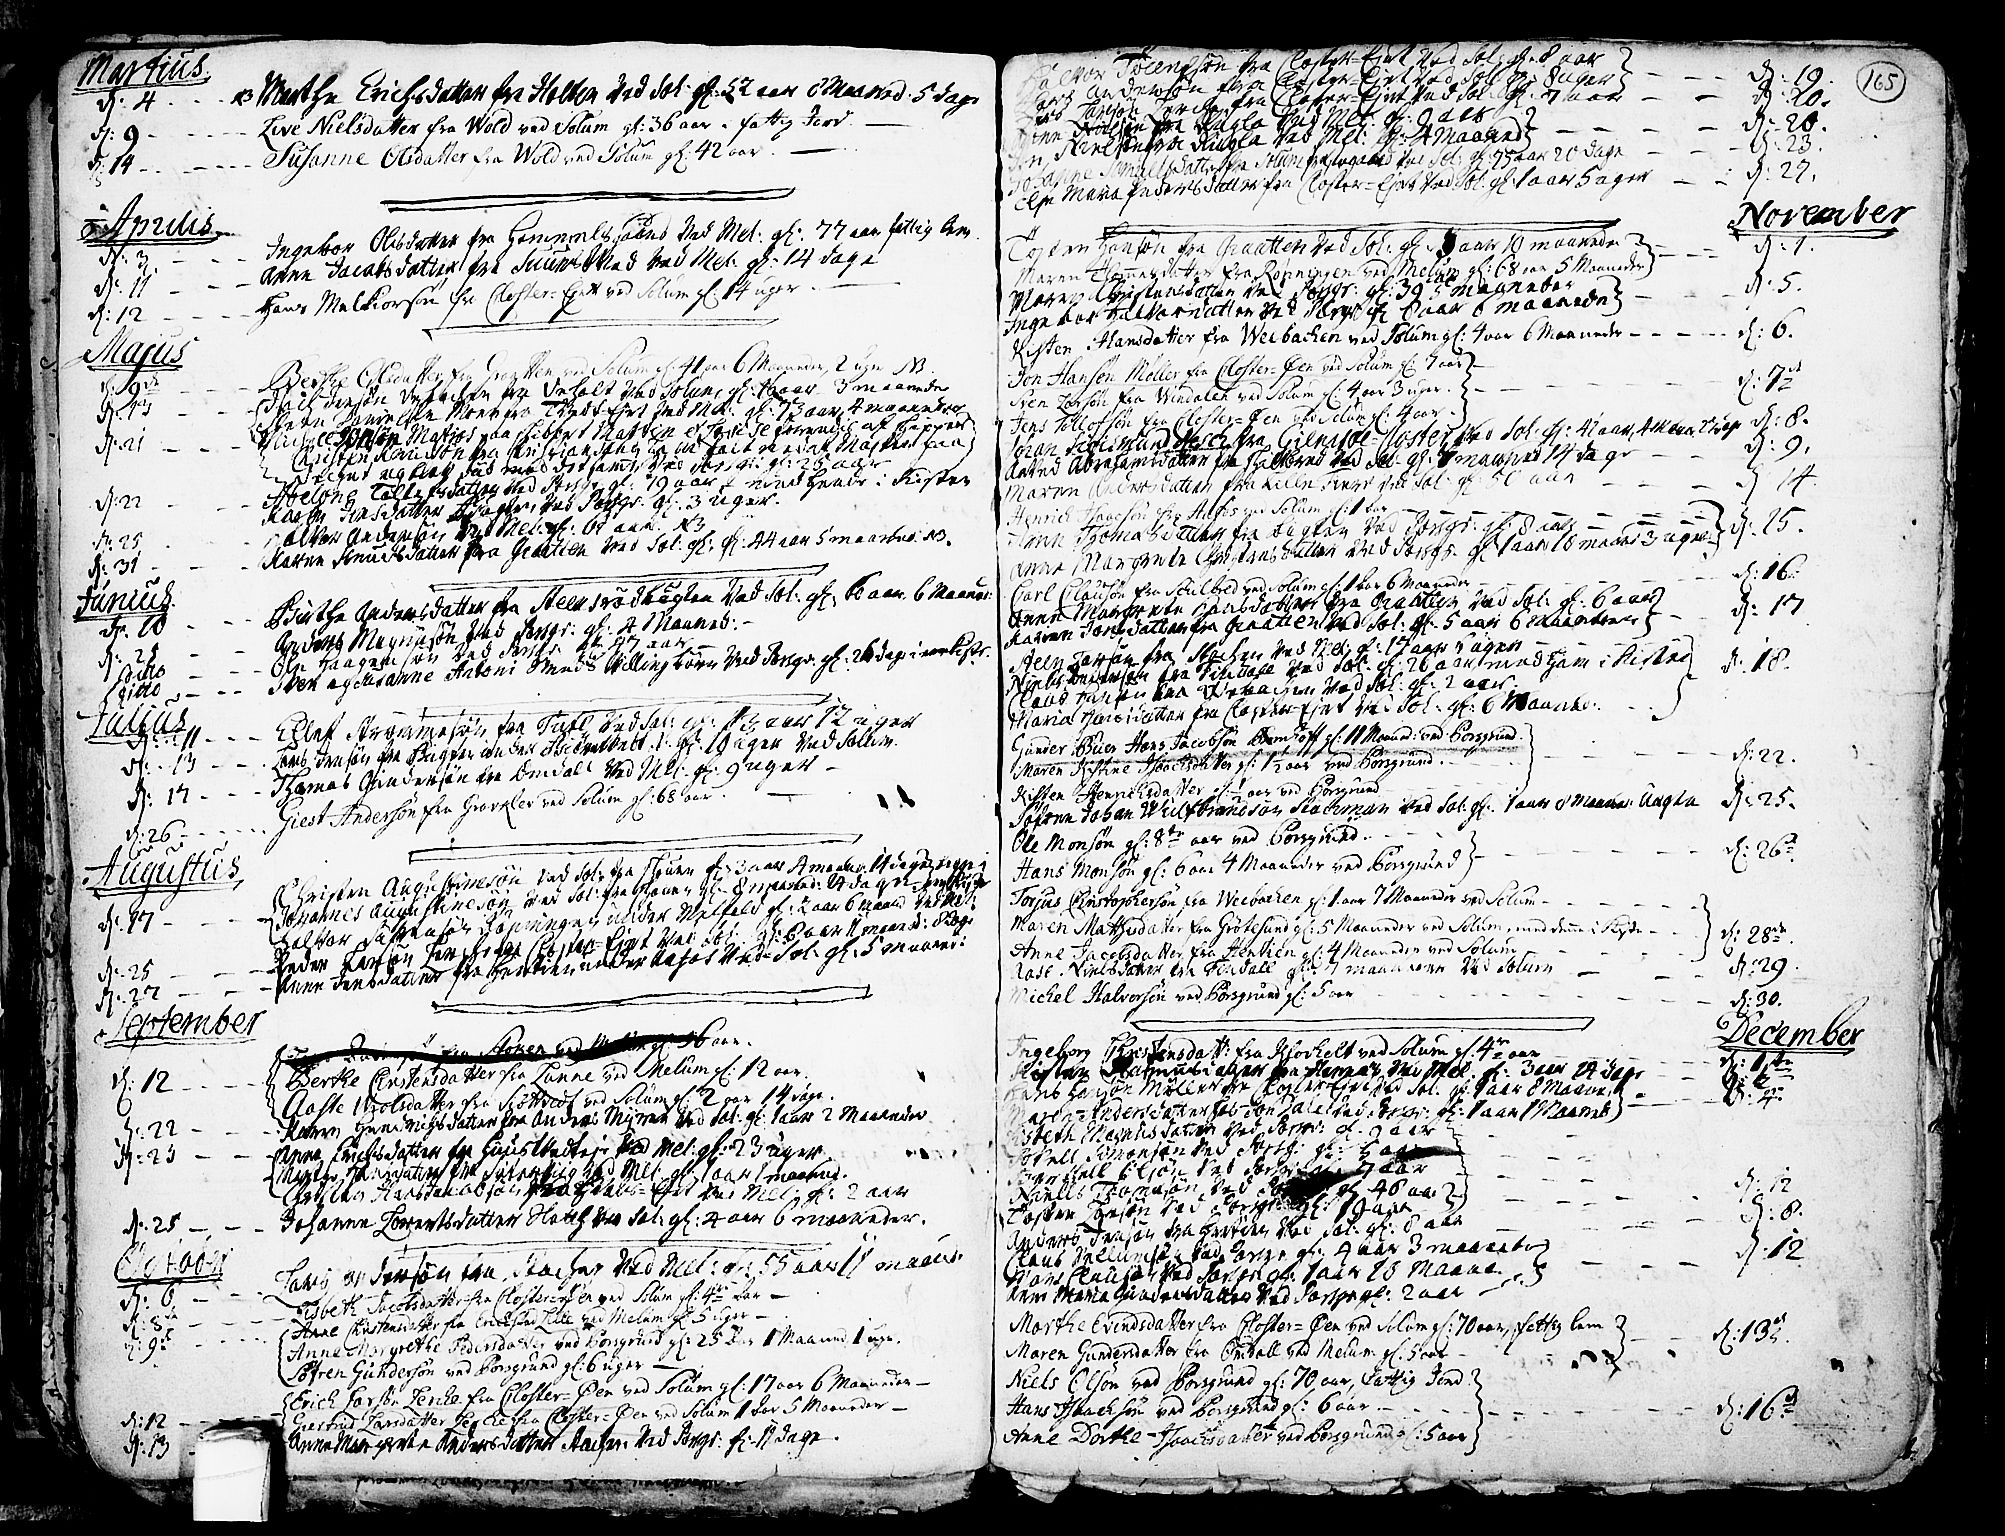 SAKO, Solum kirkebøker, F/Fa/L0002: Ministerialbok nr. I 2, 1713-1761, s. 165